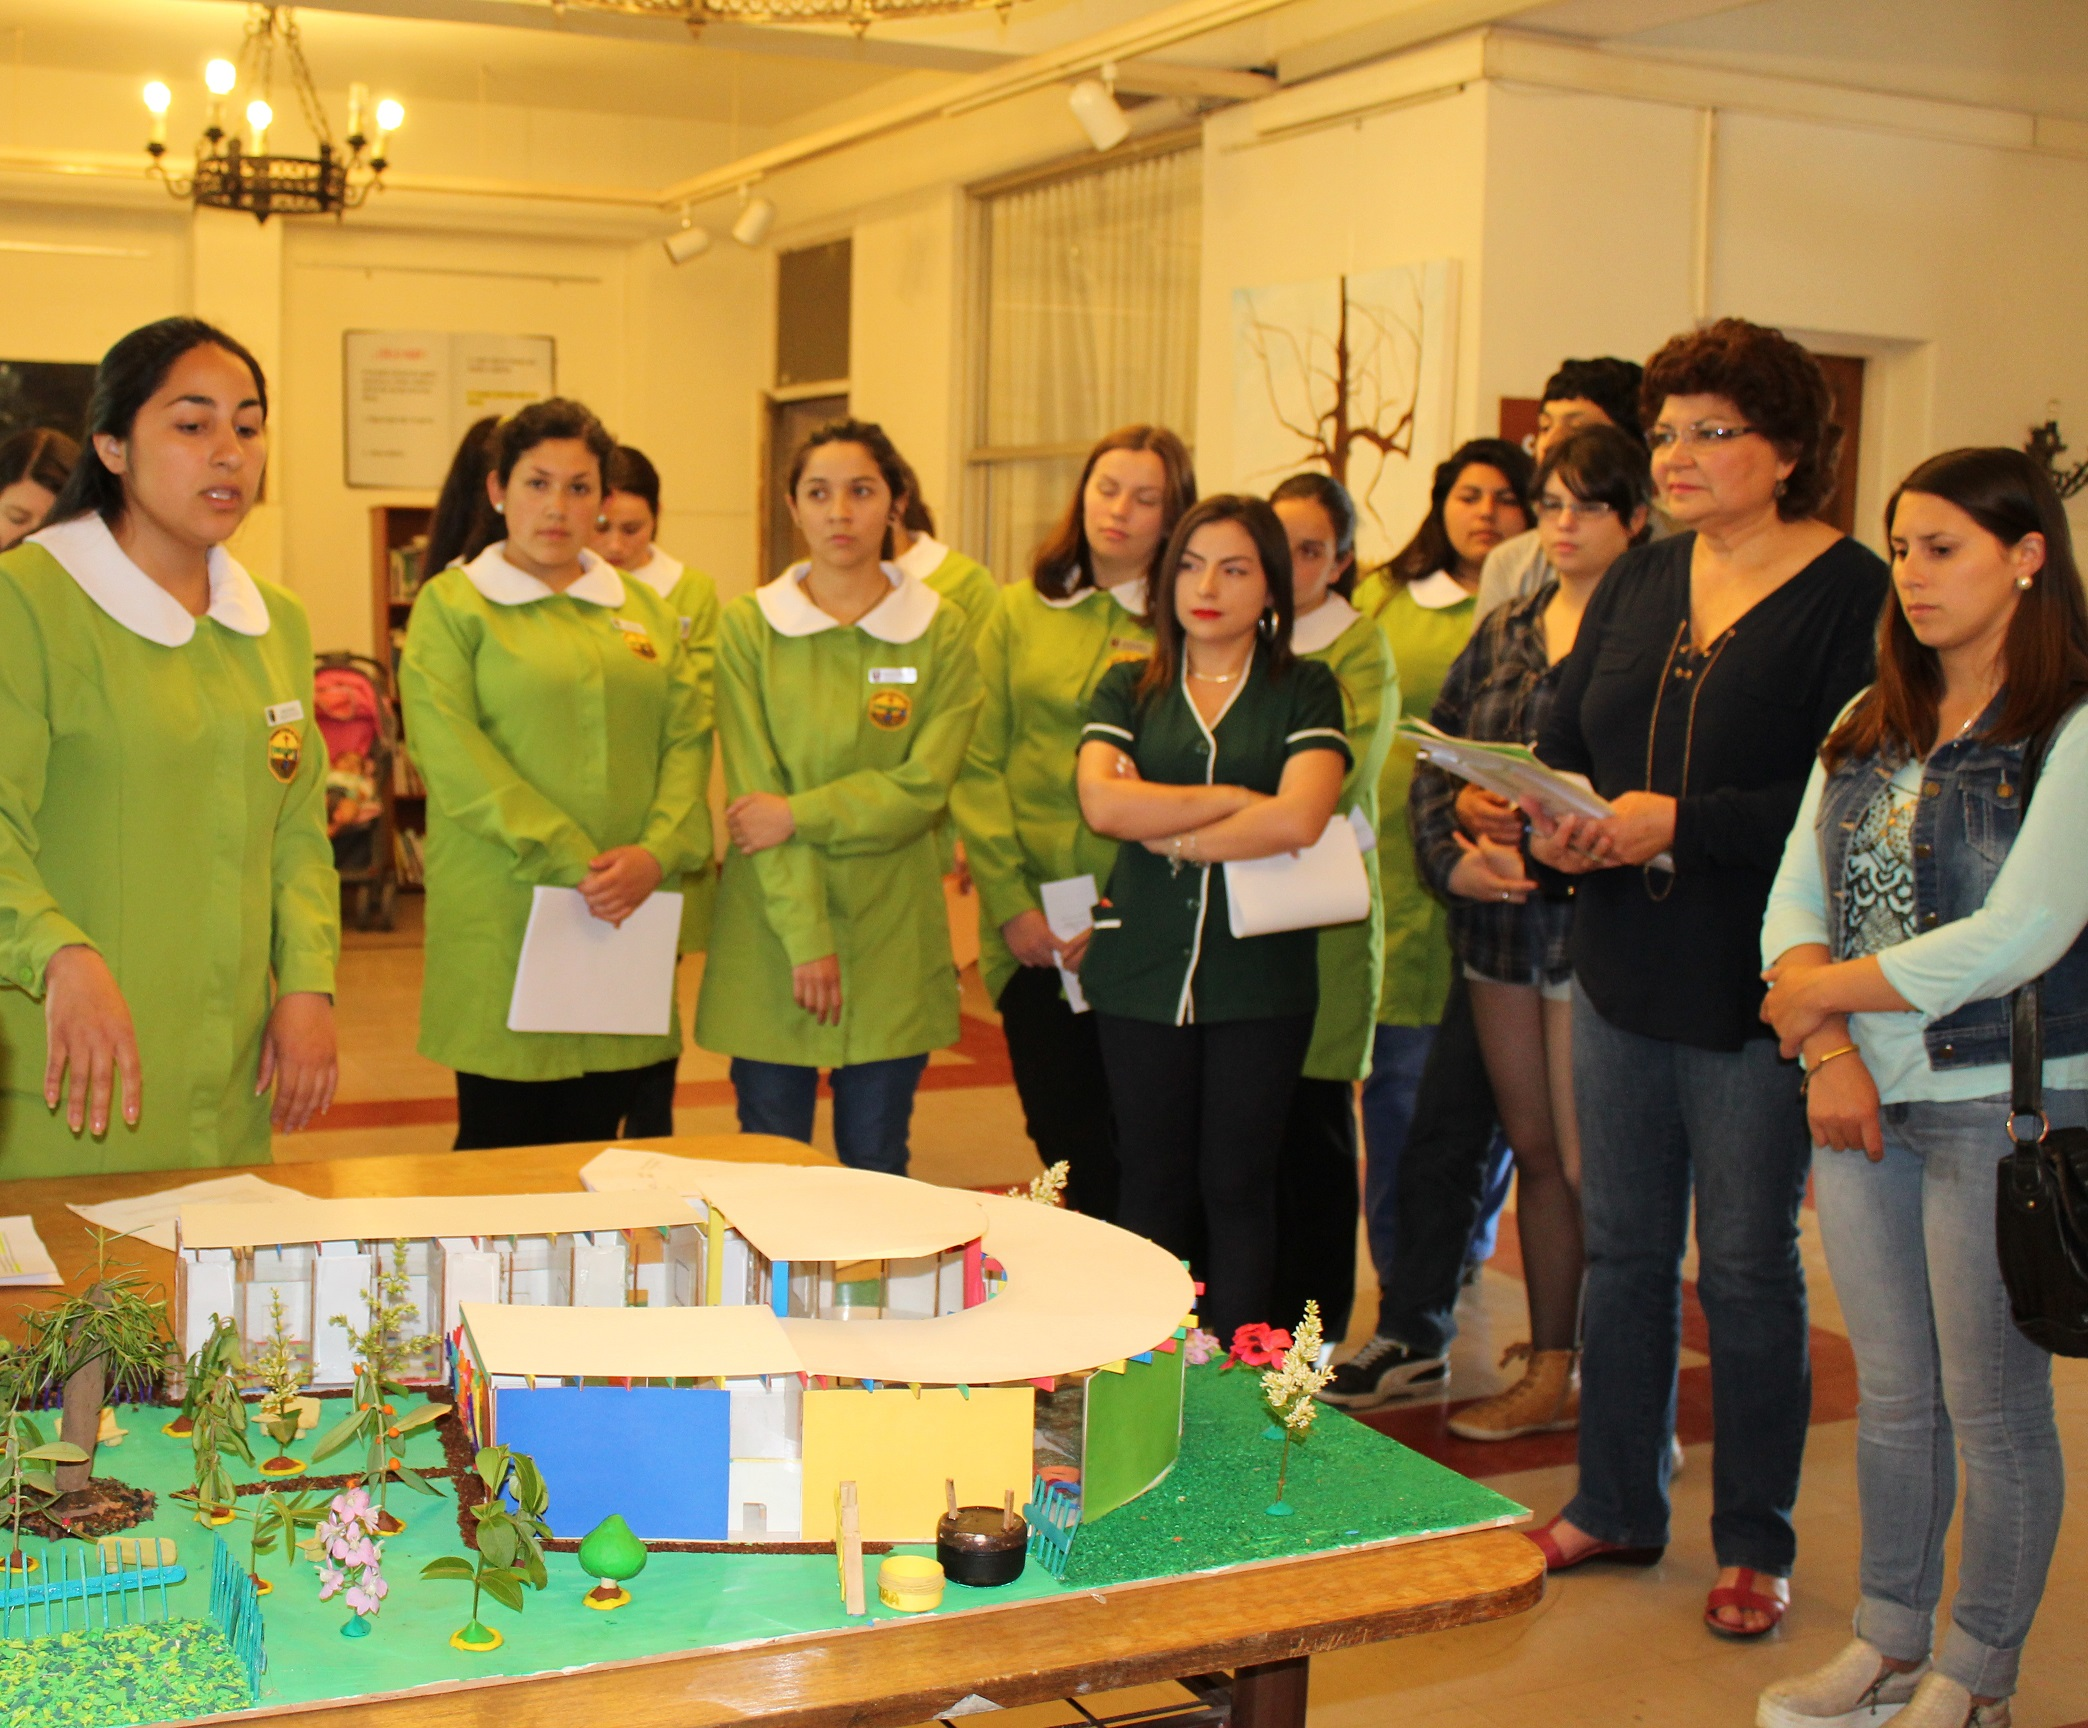 Estudiantes ucm dise an innovadores modelos de jardines for Jardin infantil